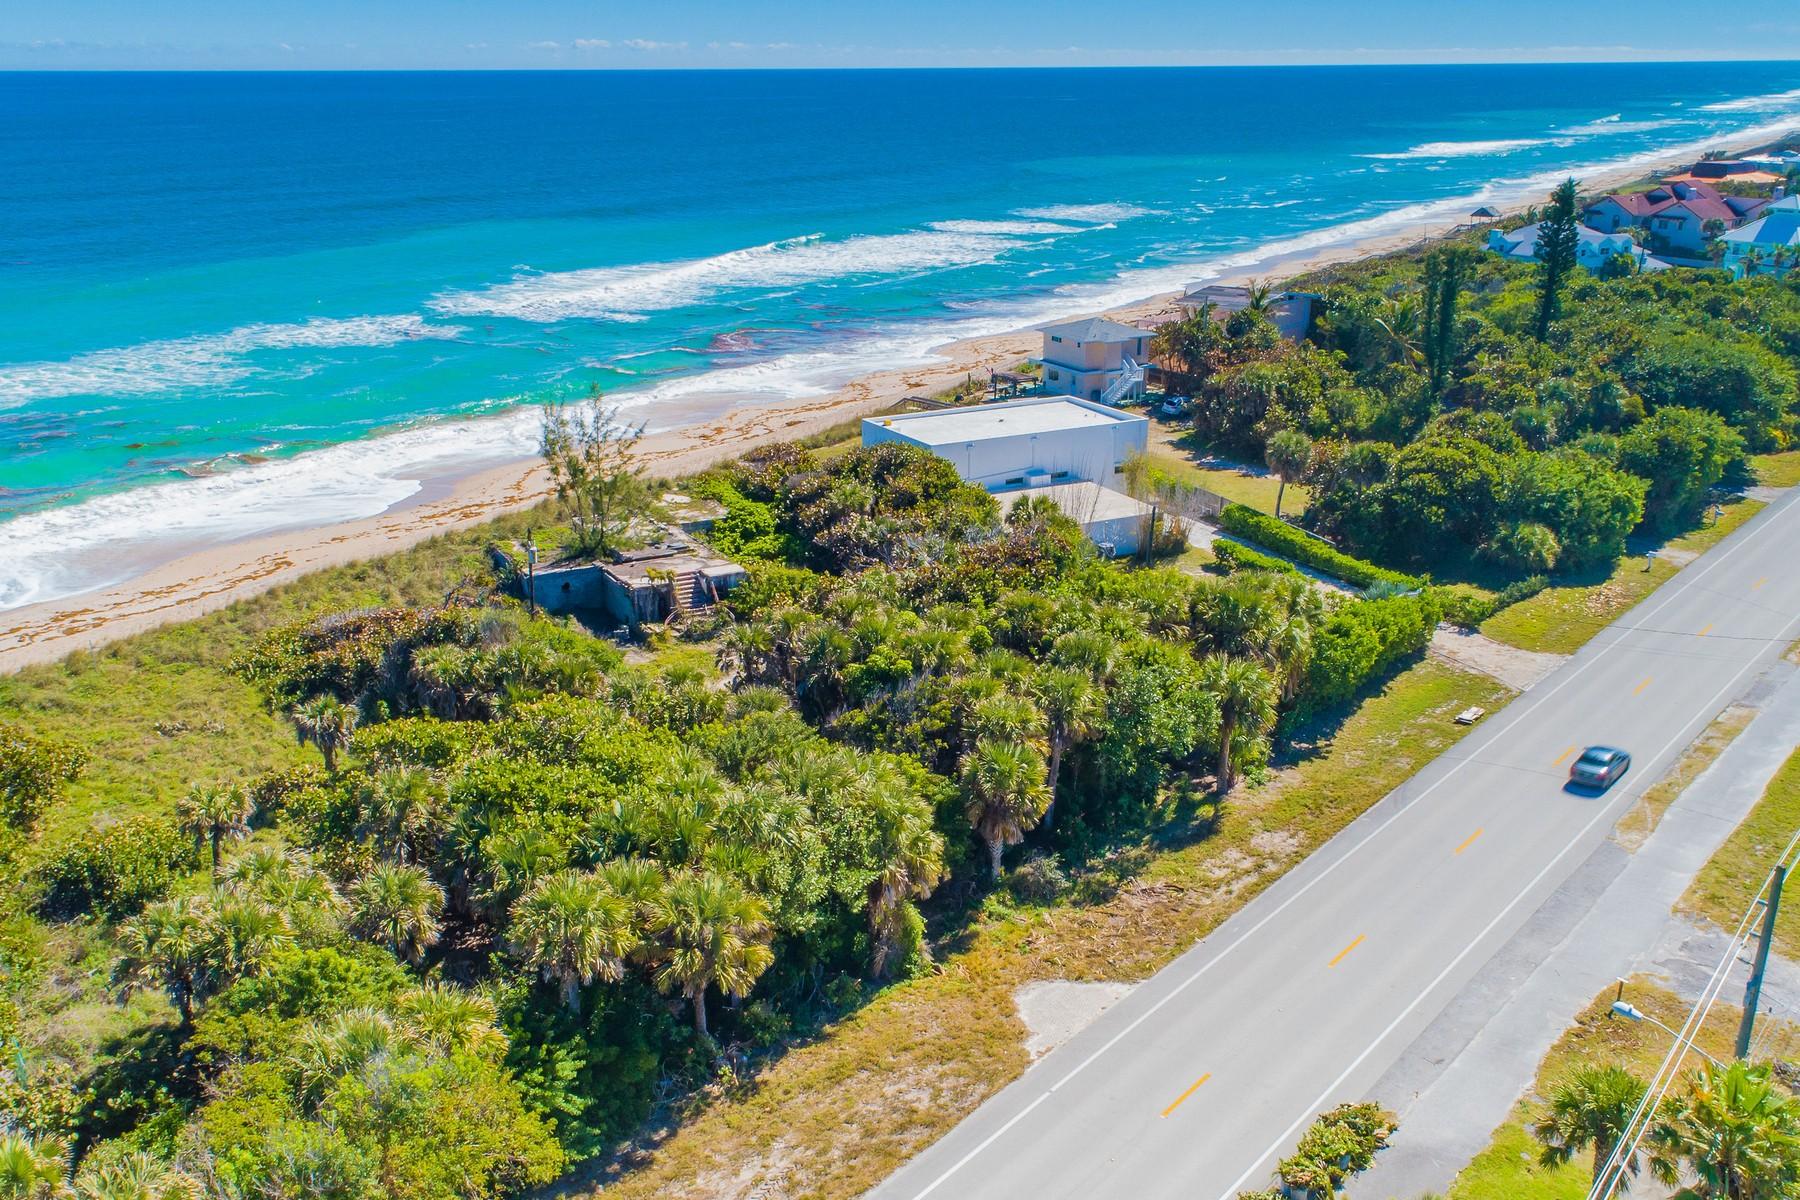 土地,用地 为 销售 在 Exceptional Oceanfront Property with Over an Acre of Private Land. 8035 S Highway A1A 墨尔本海滩, 佛罗里达州 32951 美国